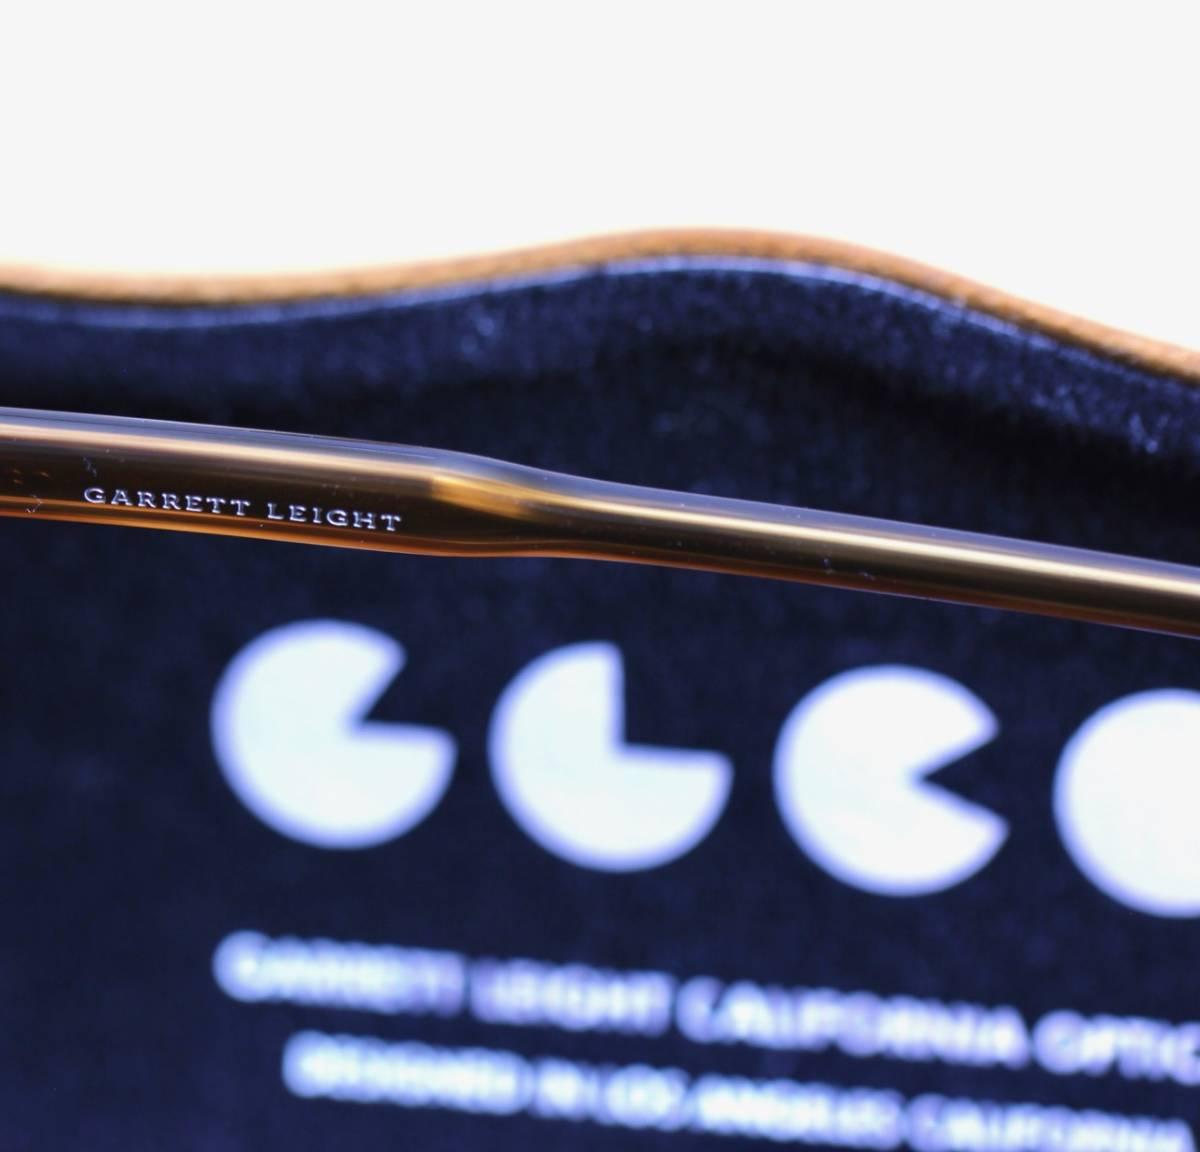 GLCO ギャレットレイト Hampton 44 眼鏡/サングラス兼用セルフレーム(GARRETT LEIGHT California Optical/オリバーピープルズ系列ブランド)_画像6